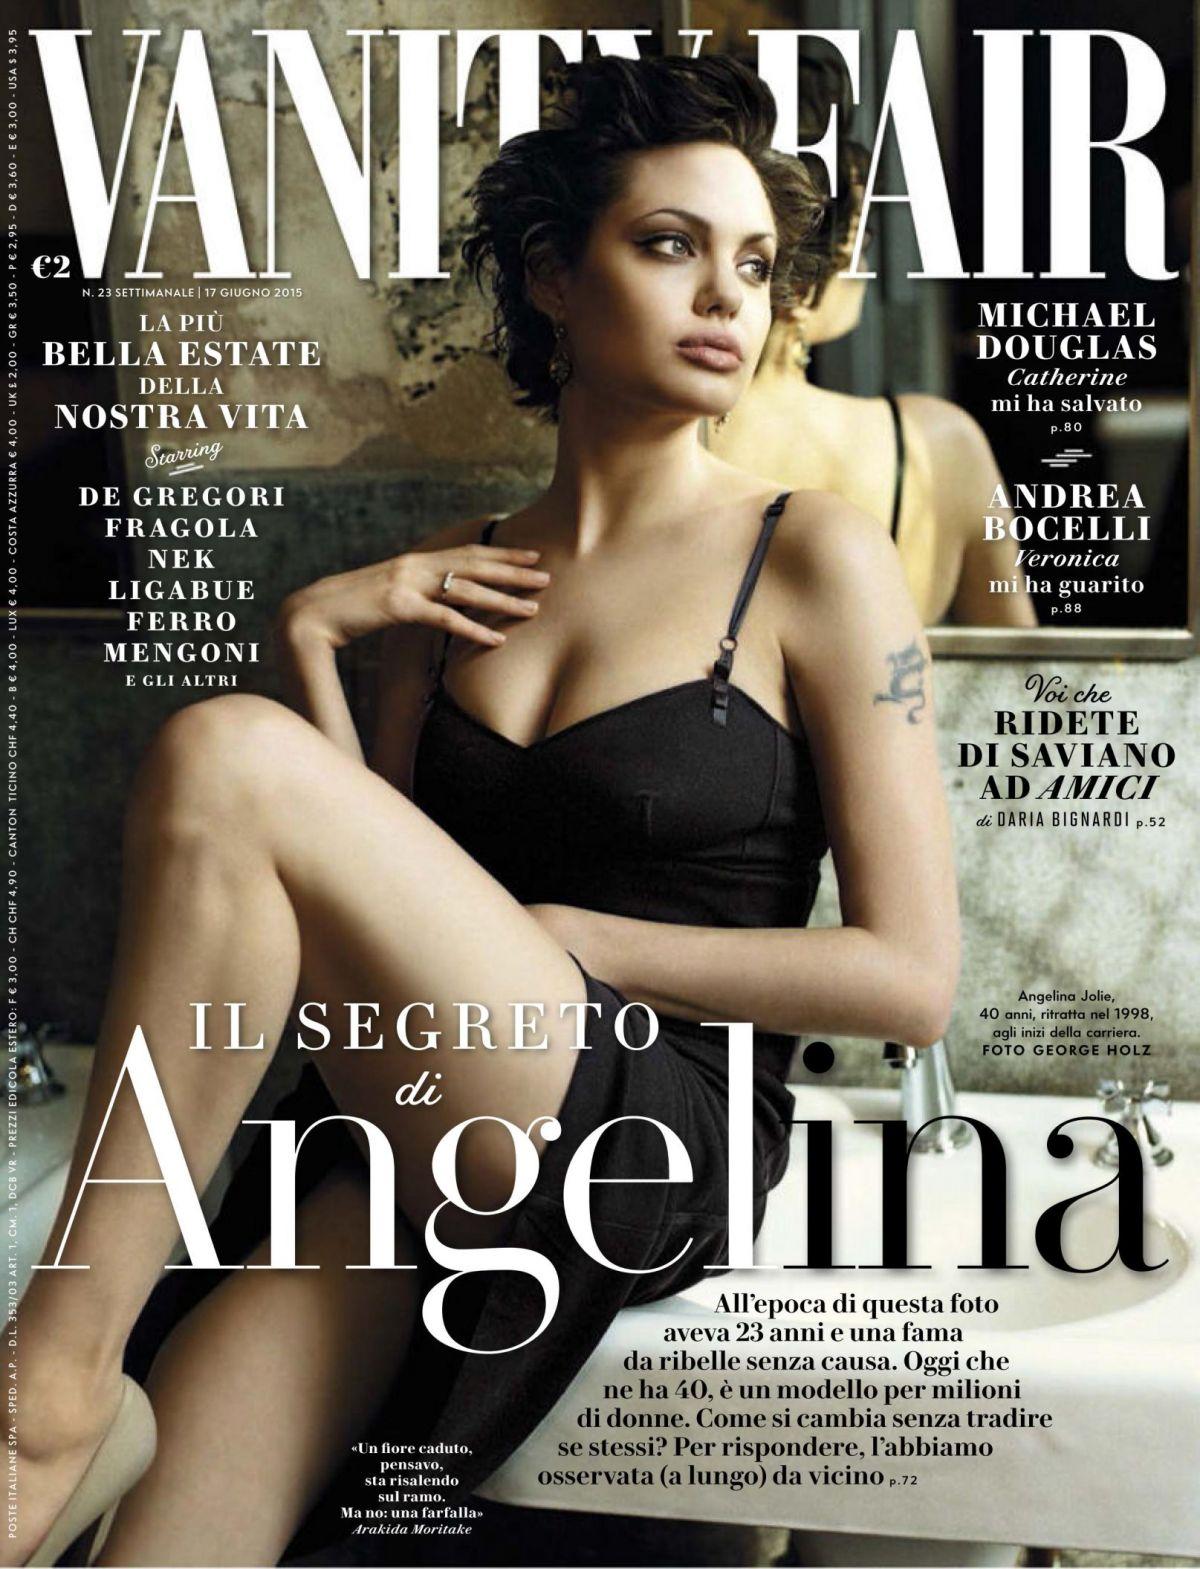 ANGELINA JOLIE in Vanity Fair Magazine, Italy June 2015 Issue